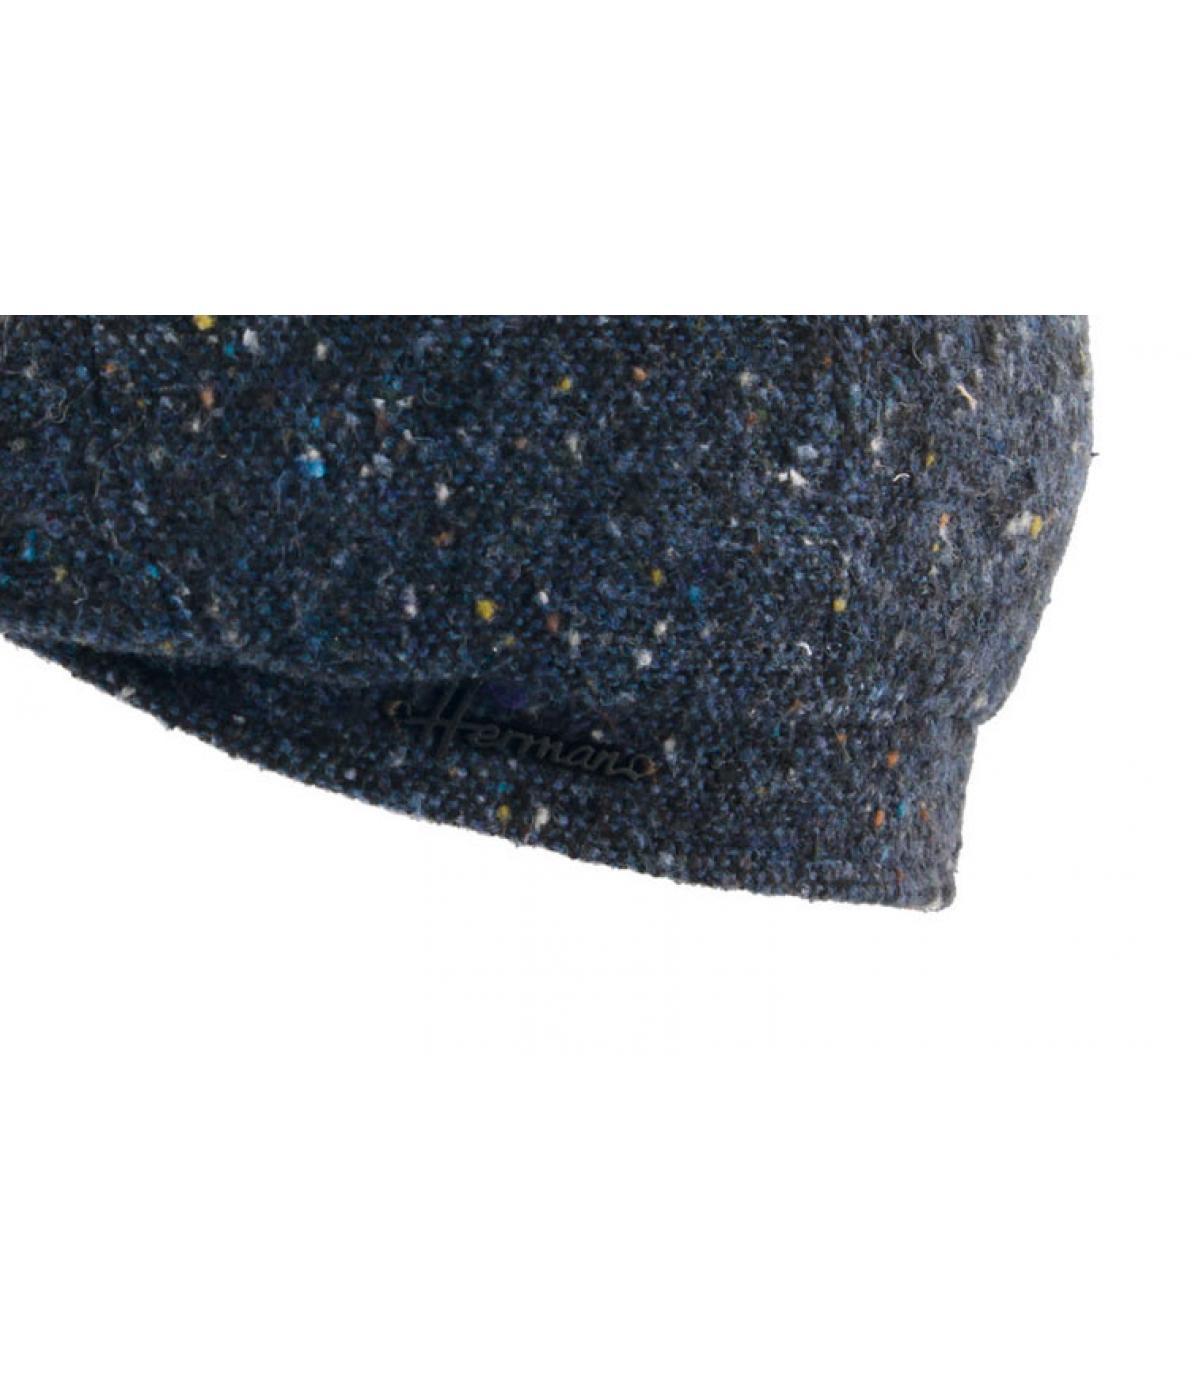 Dettagli Advancer Dot Wool  blue - image 3